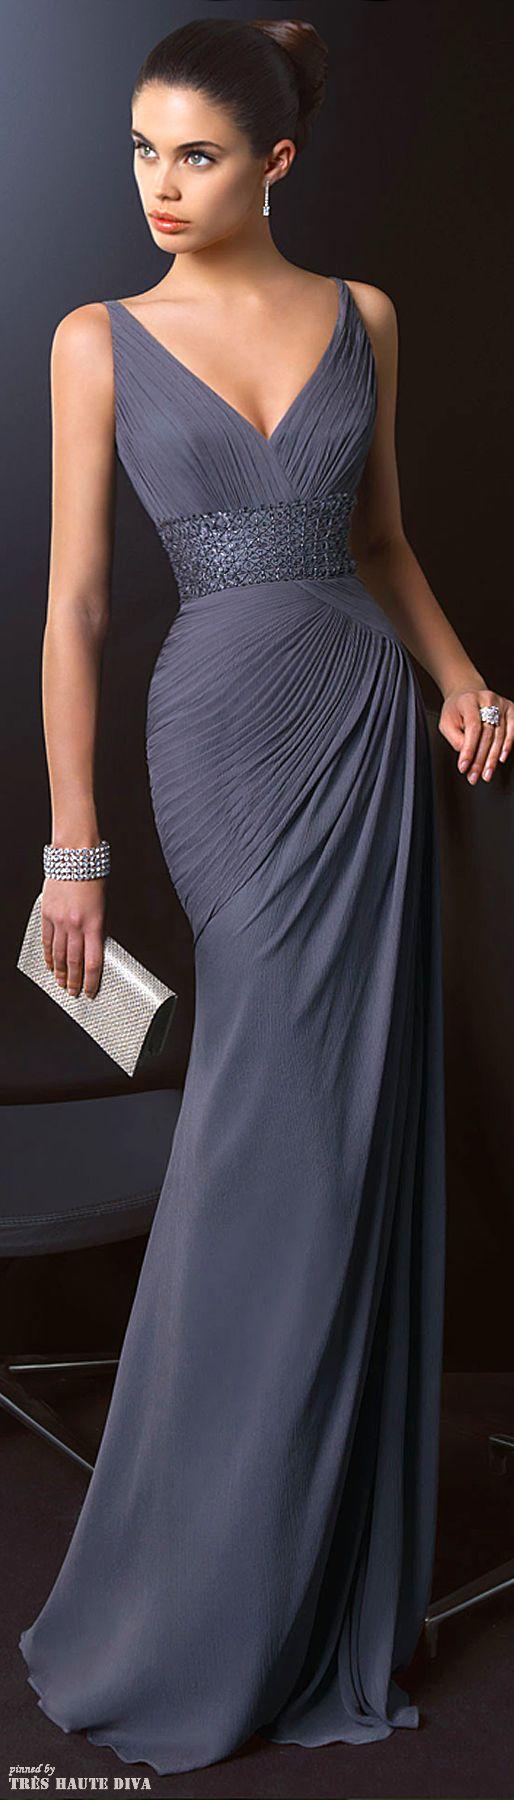 ed3190940c Party Night Dresses Pinterest